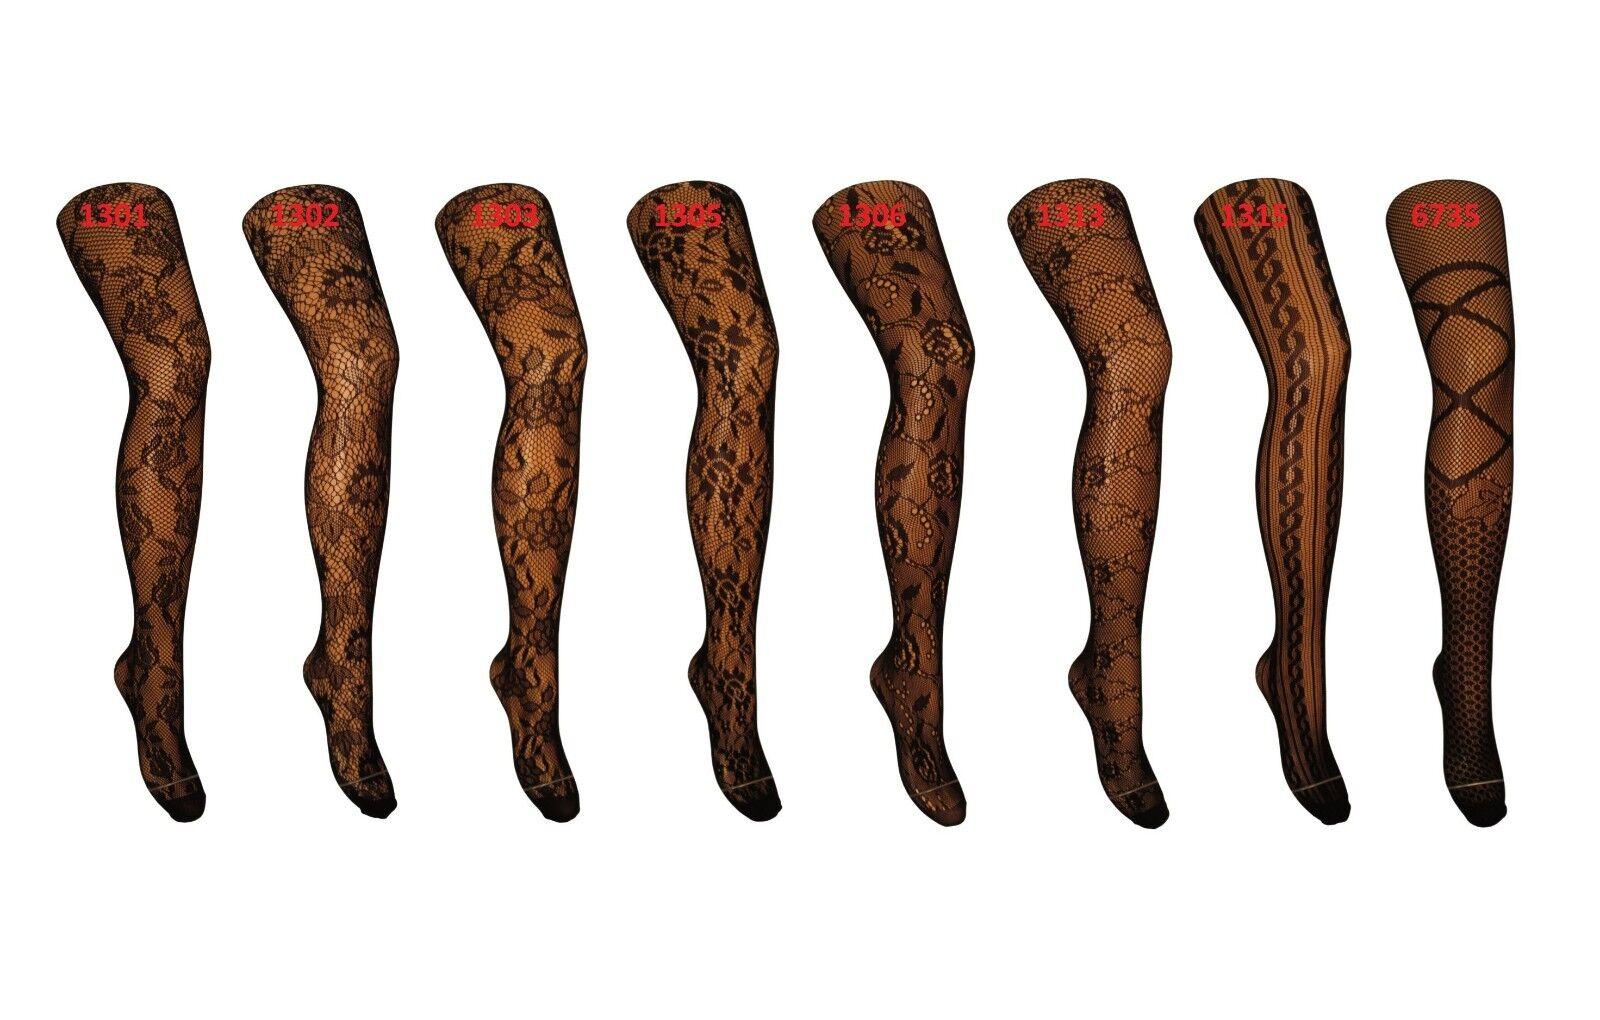 Damen Strumpfhosen mit Muster Damenstrumpfhose Netzstrumpfhose schwarz A2